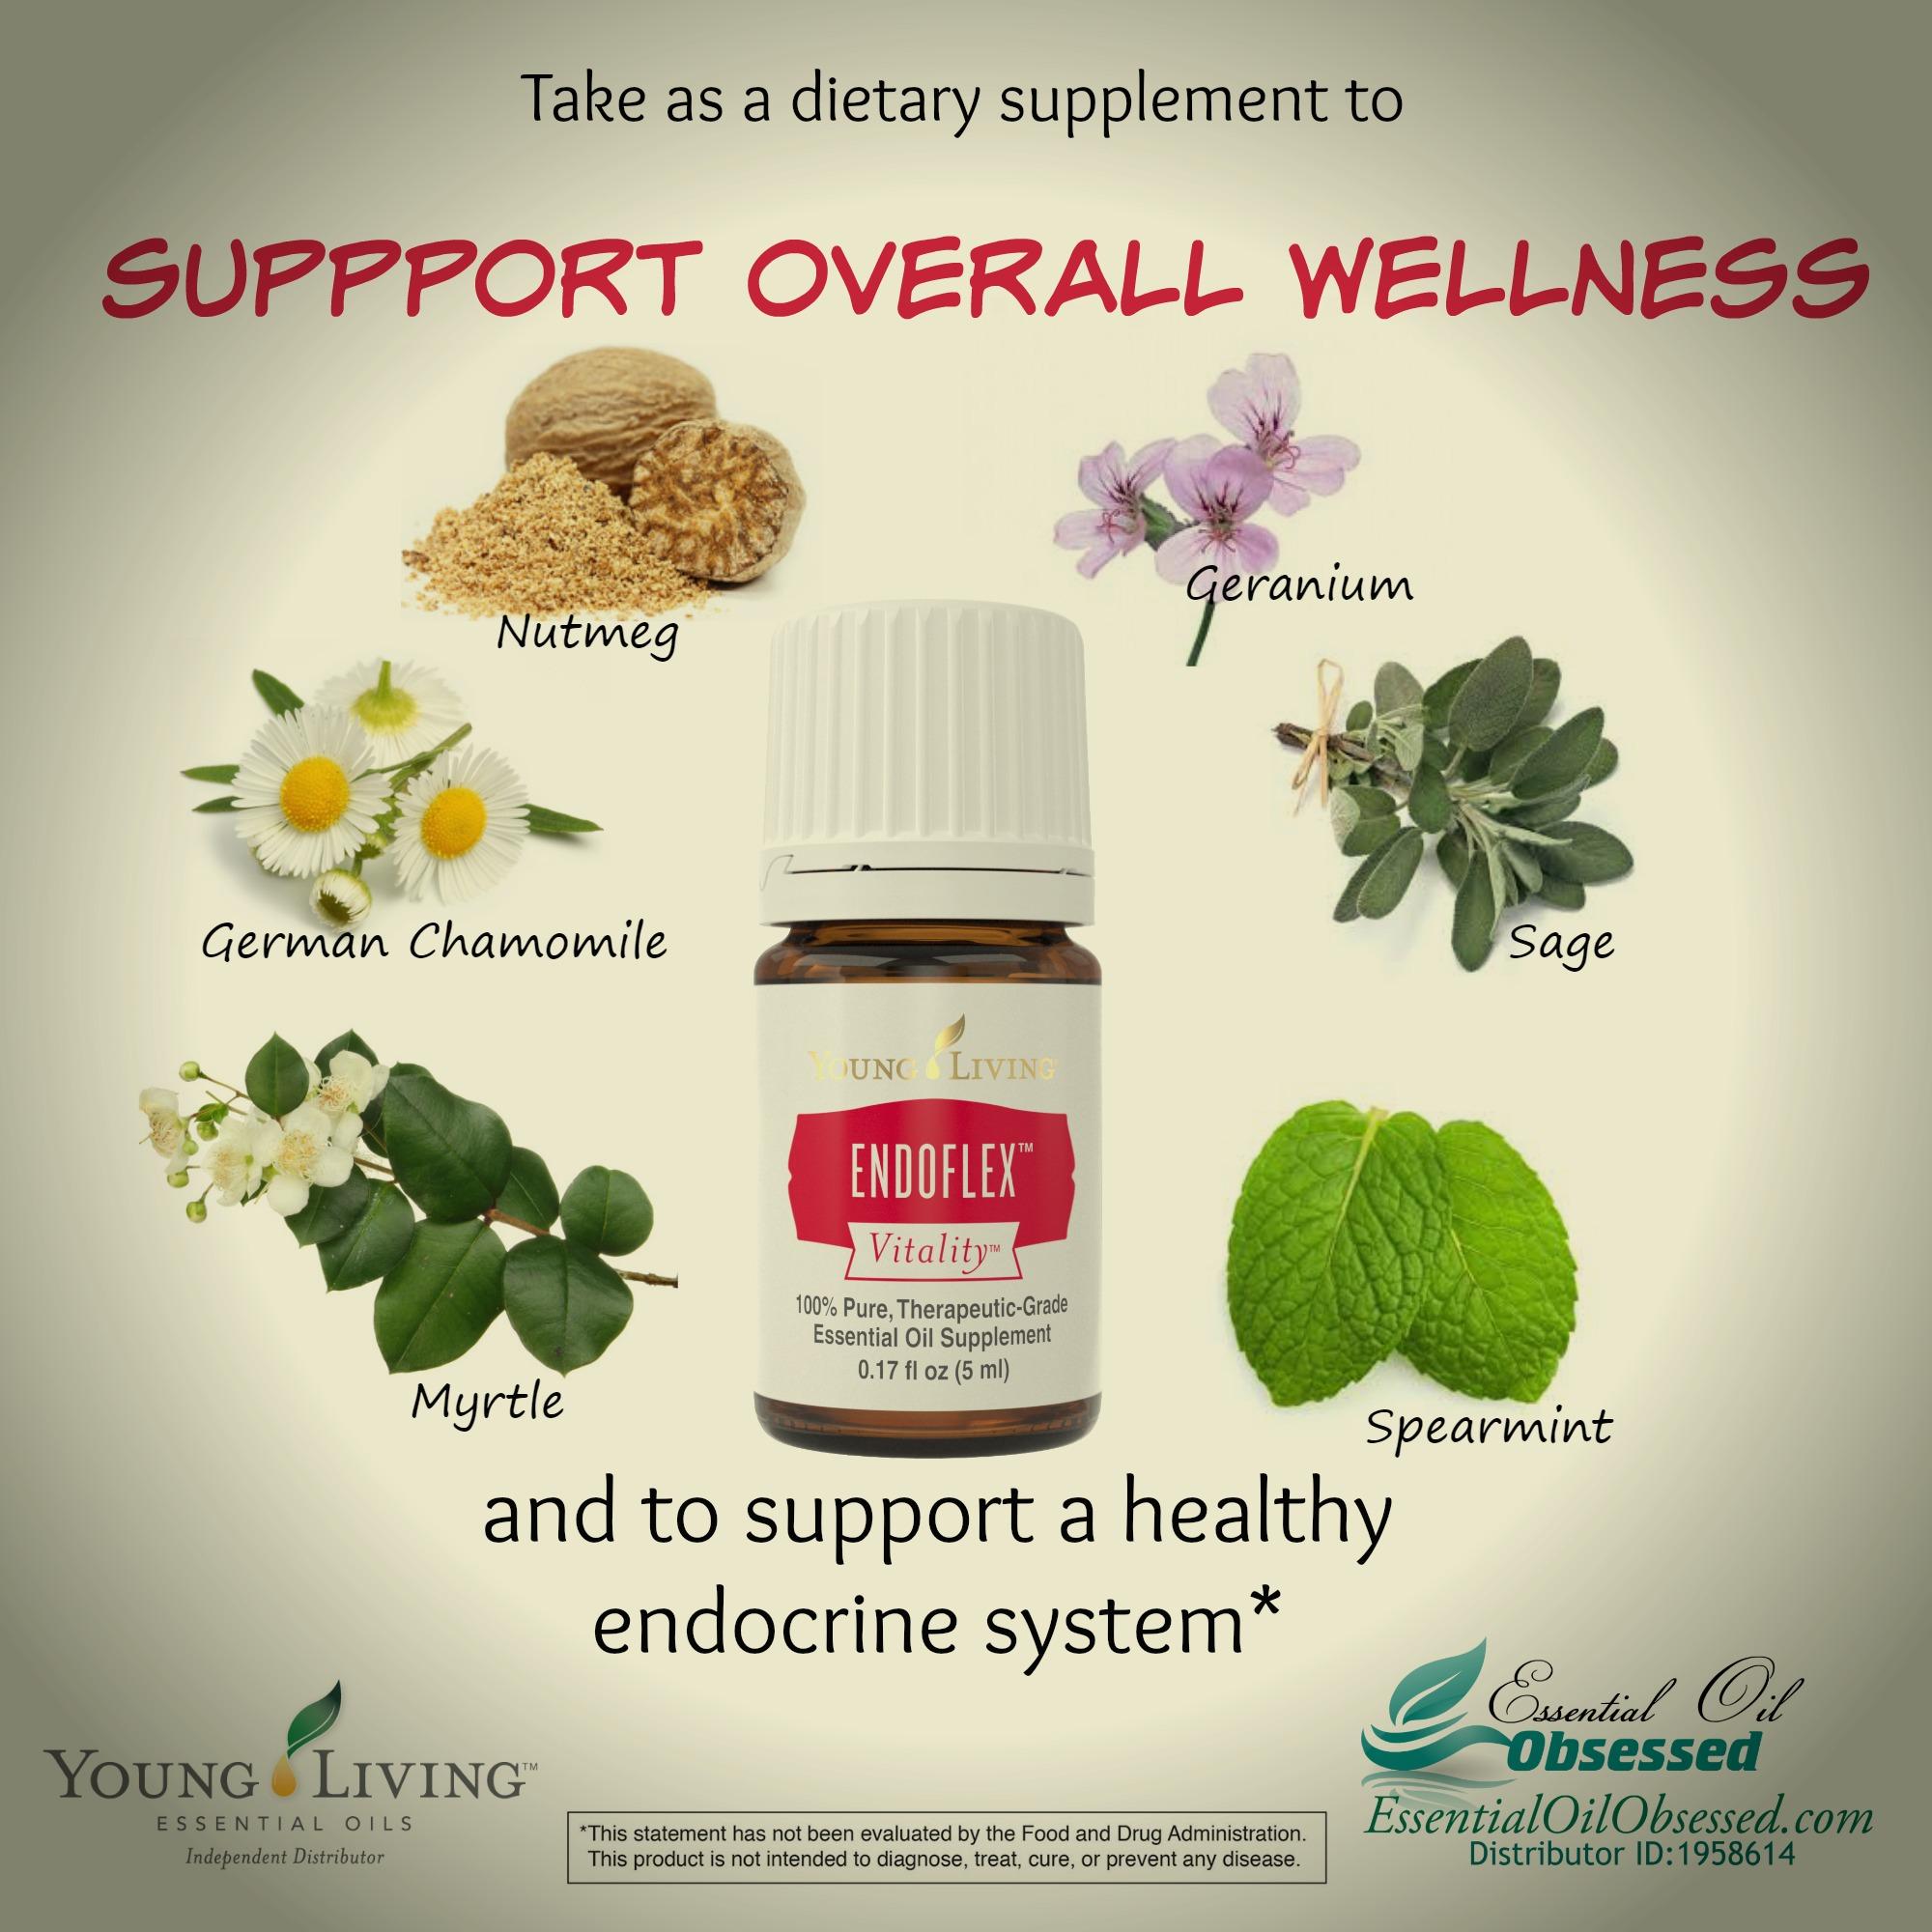 Endoflex Vitality Dietary Essential Oil Essential Oil Obsessed